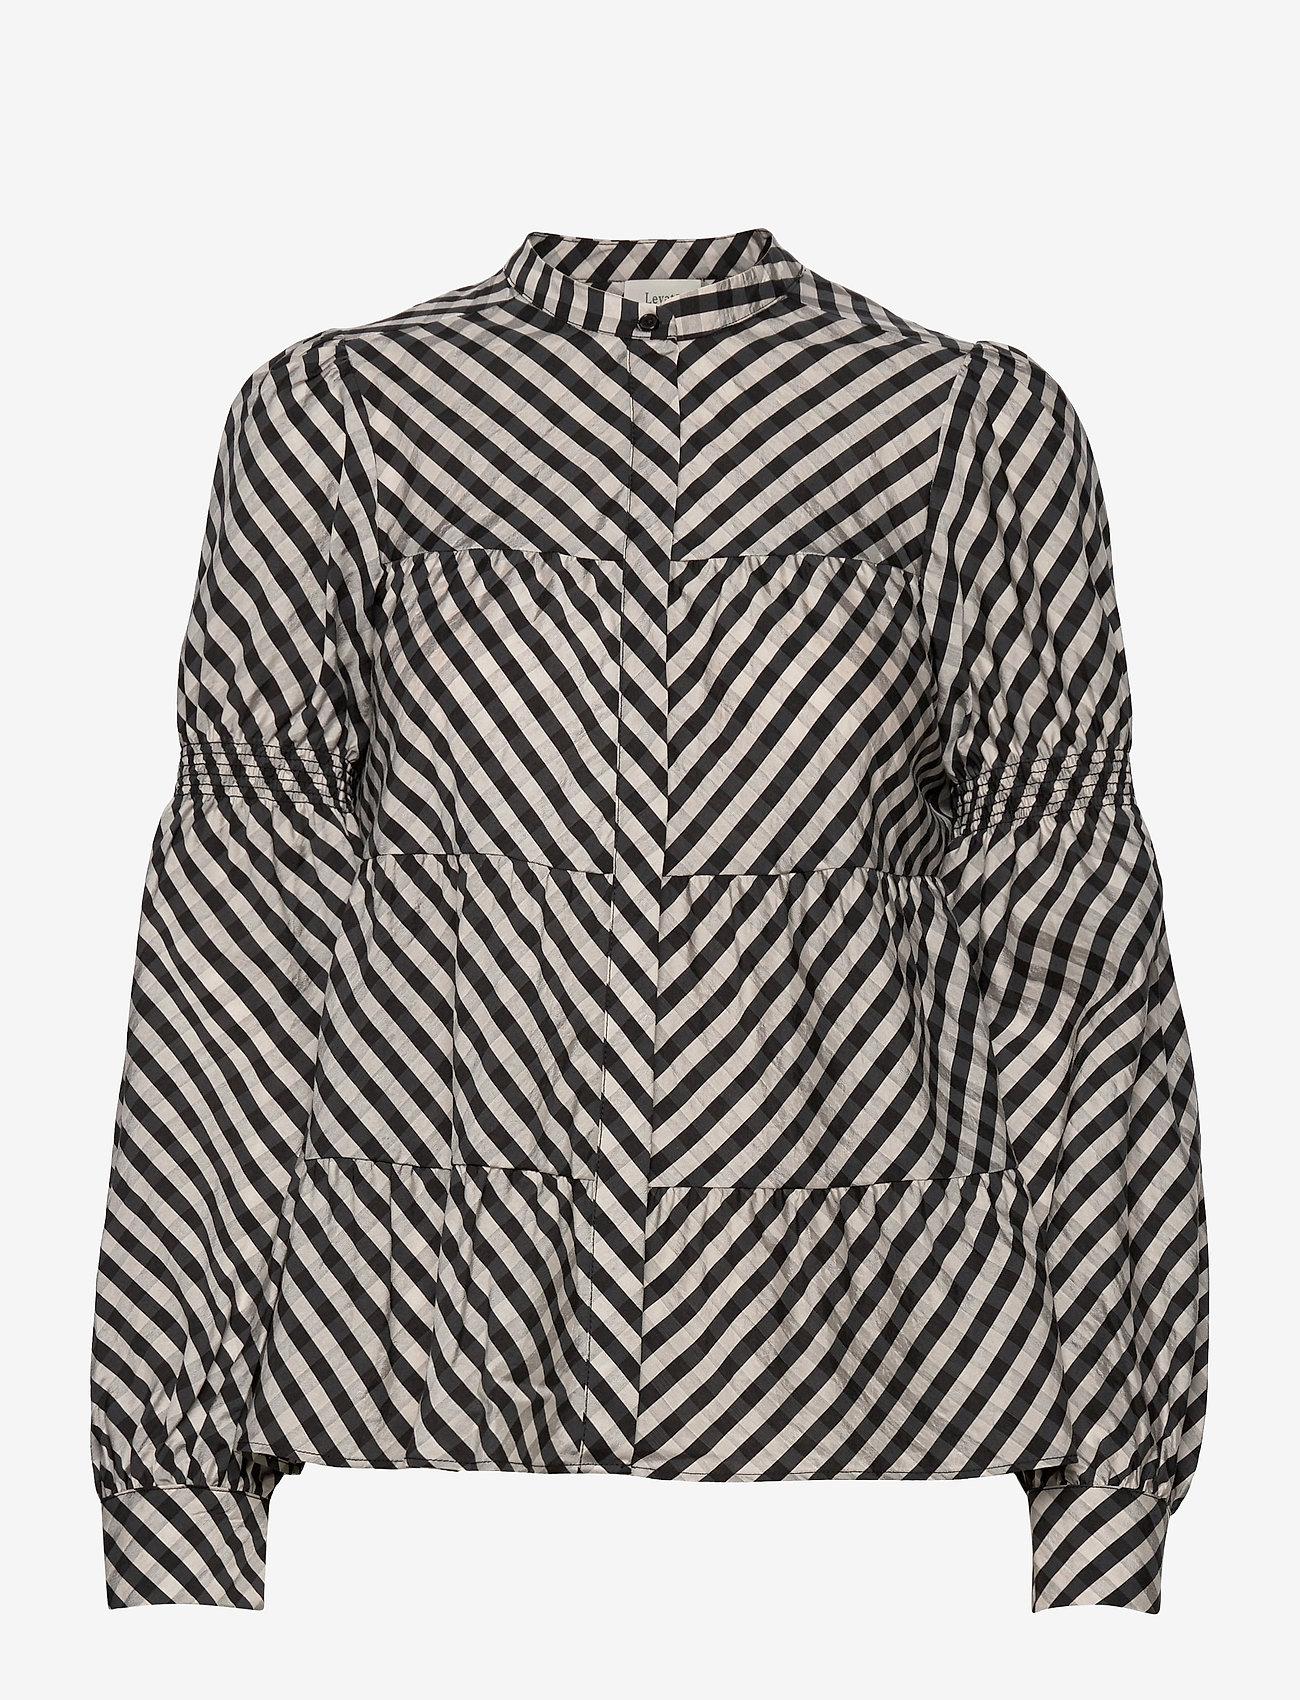 Levete Room - LR-KAMMA - long sleeved blouses - l911c - pumice stone combi - 0